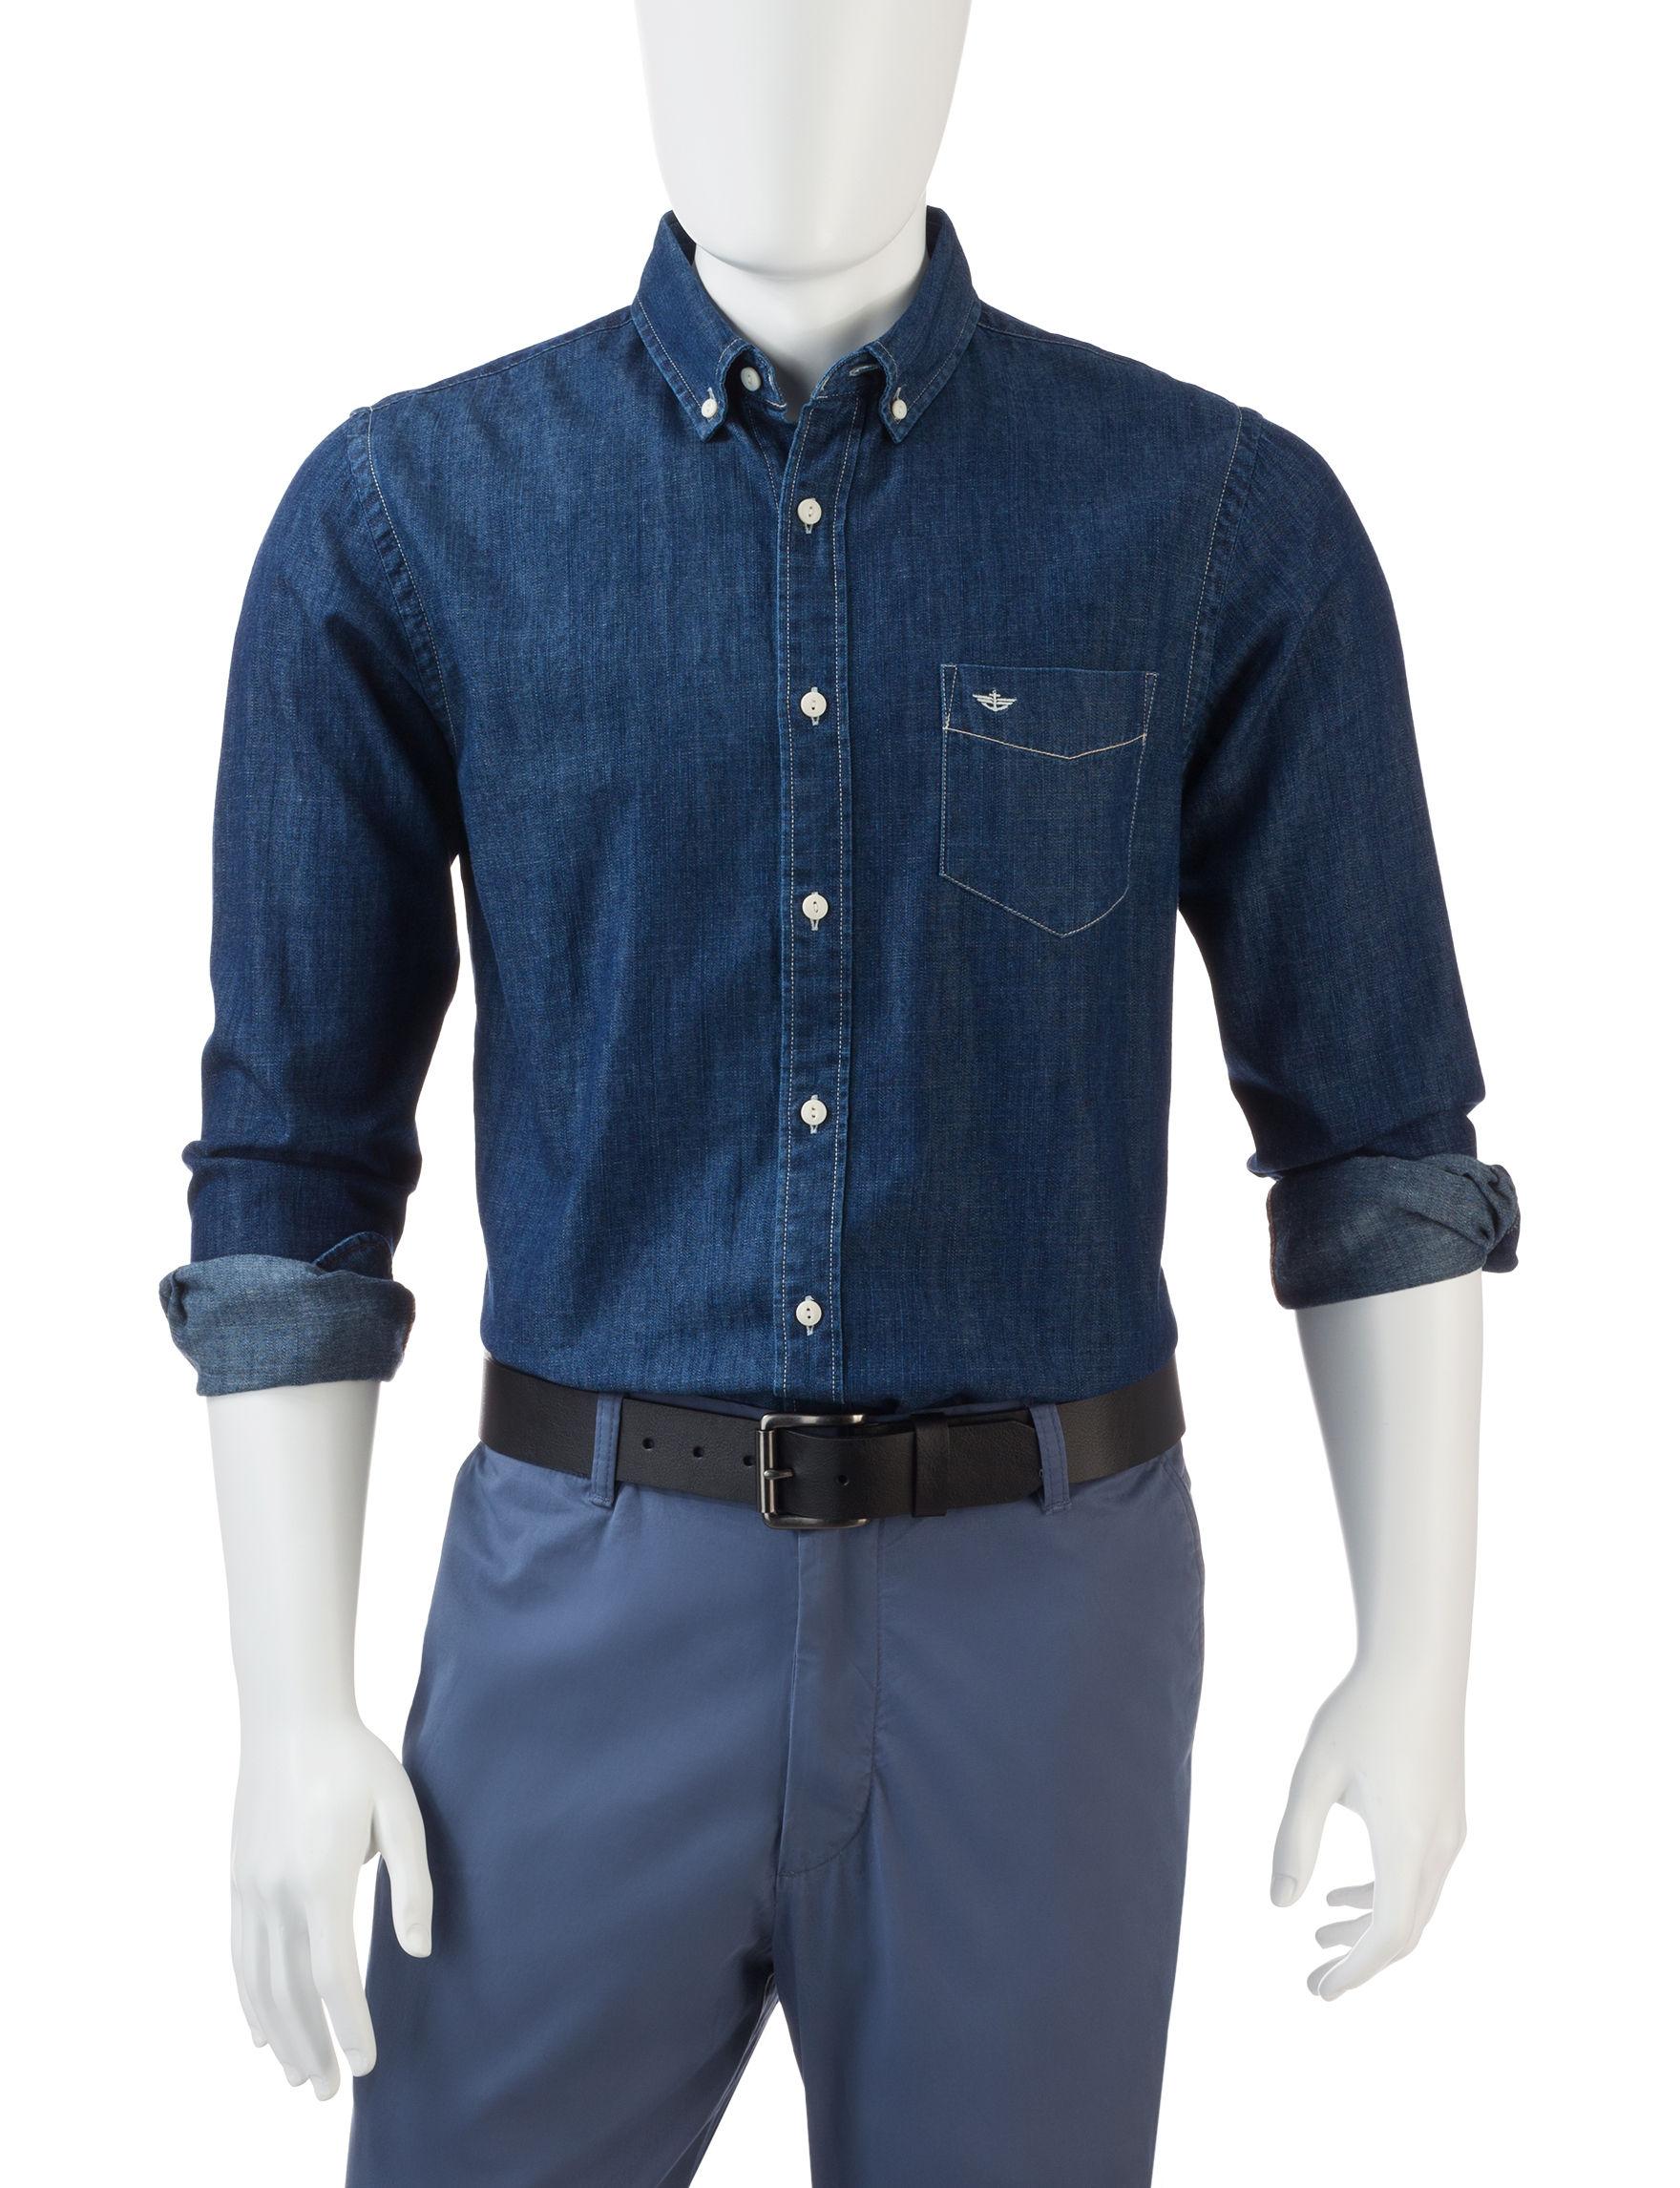 Dockers Indigo Casual Button Down Shirts